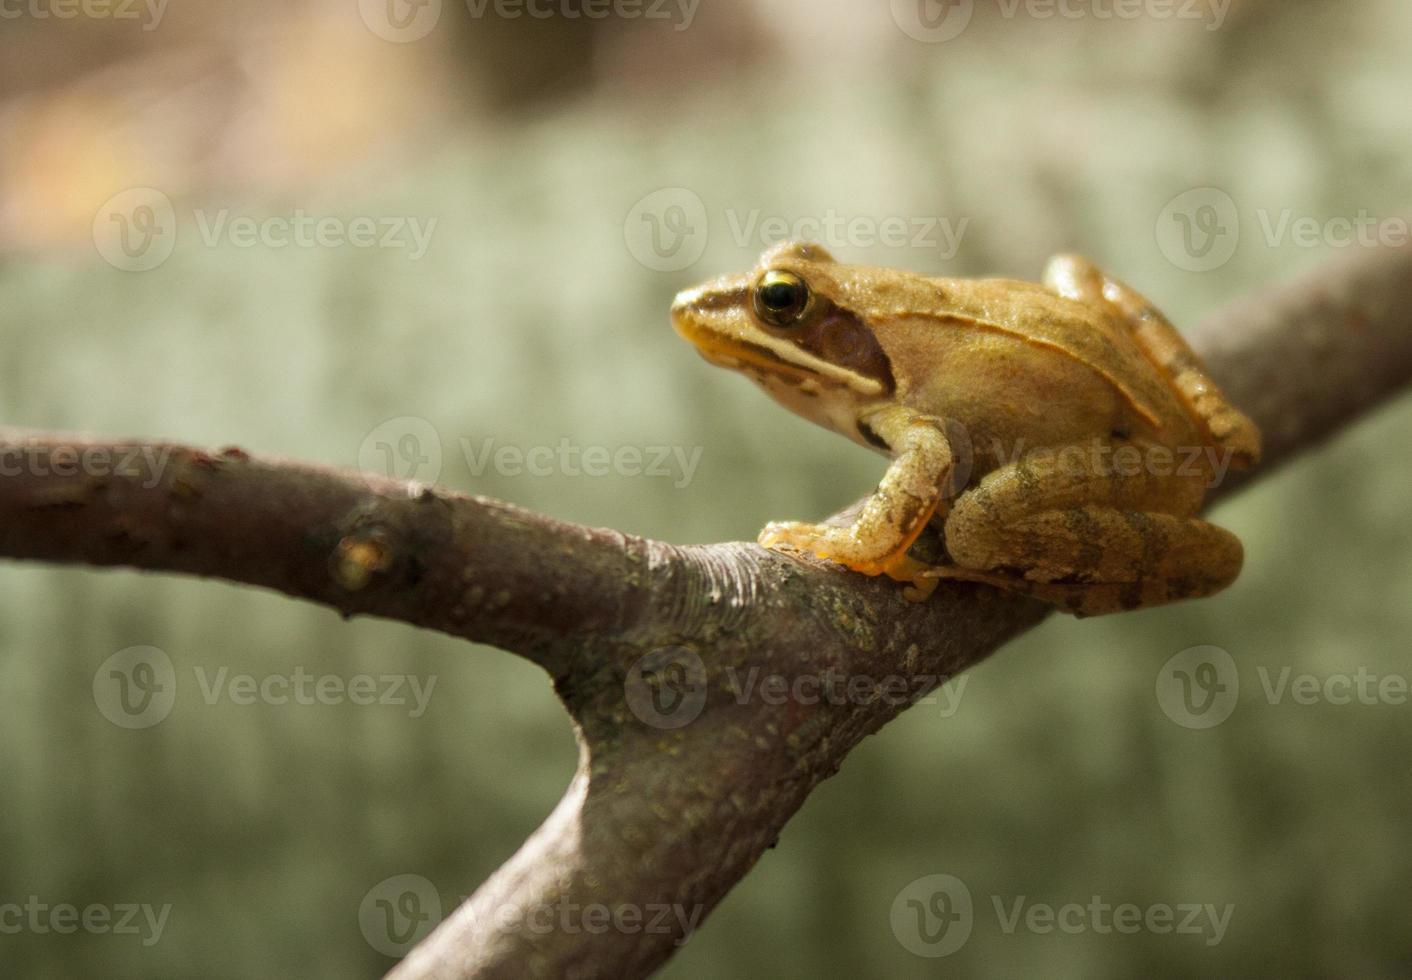 Greek stream frog (Rana graeca) photo